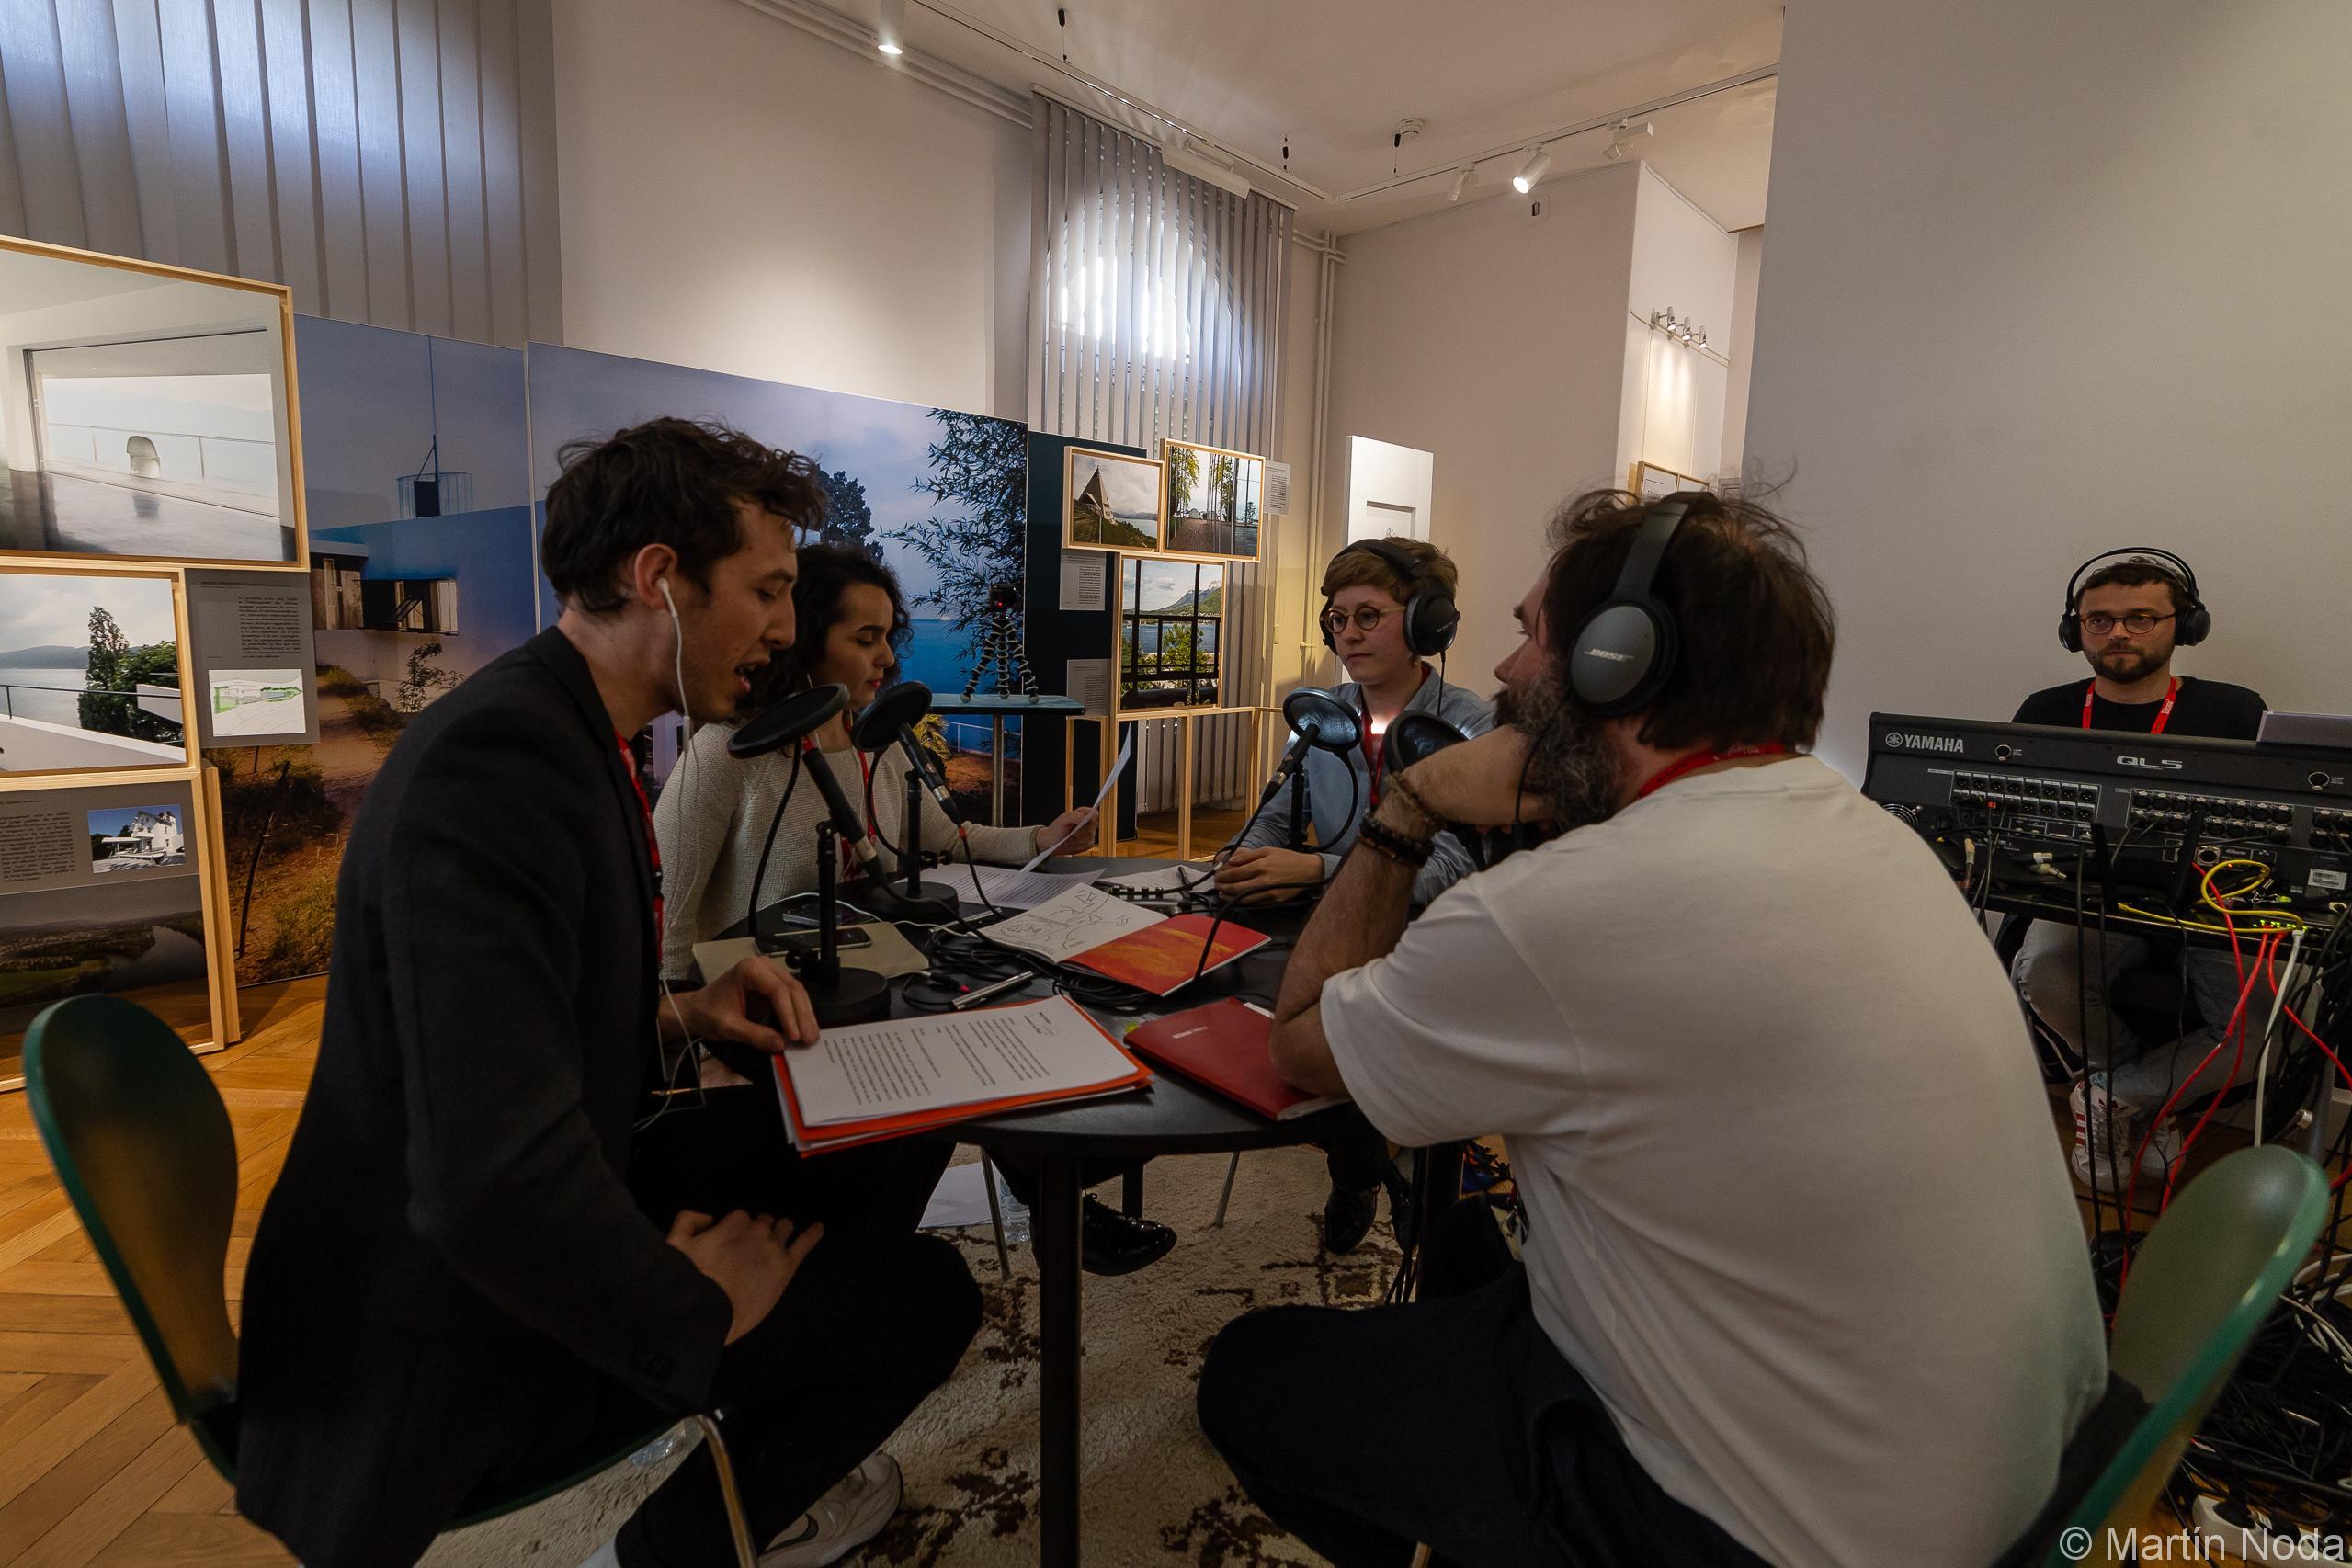 Antoine Thiollier, Jacques Perconte, Marie Kiesel et Dounia Acherar